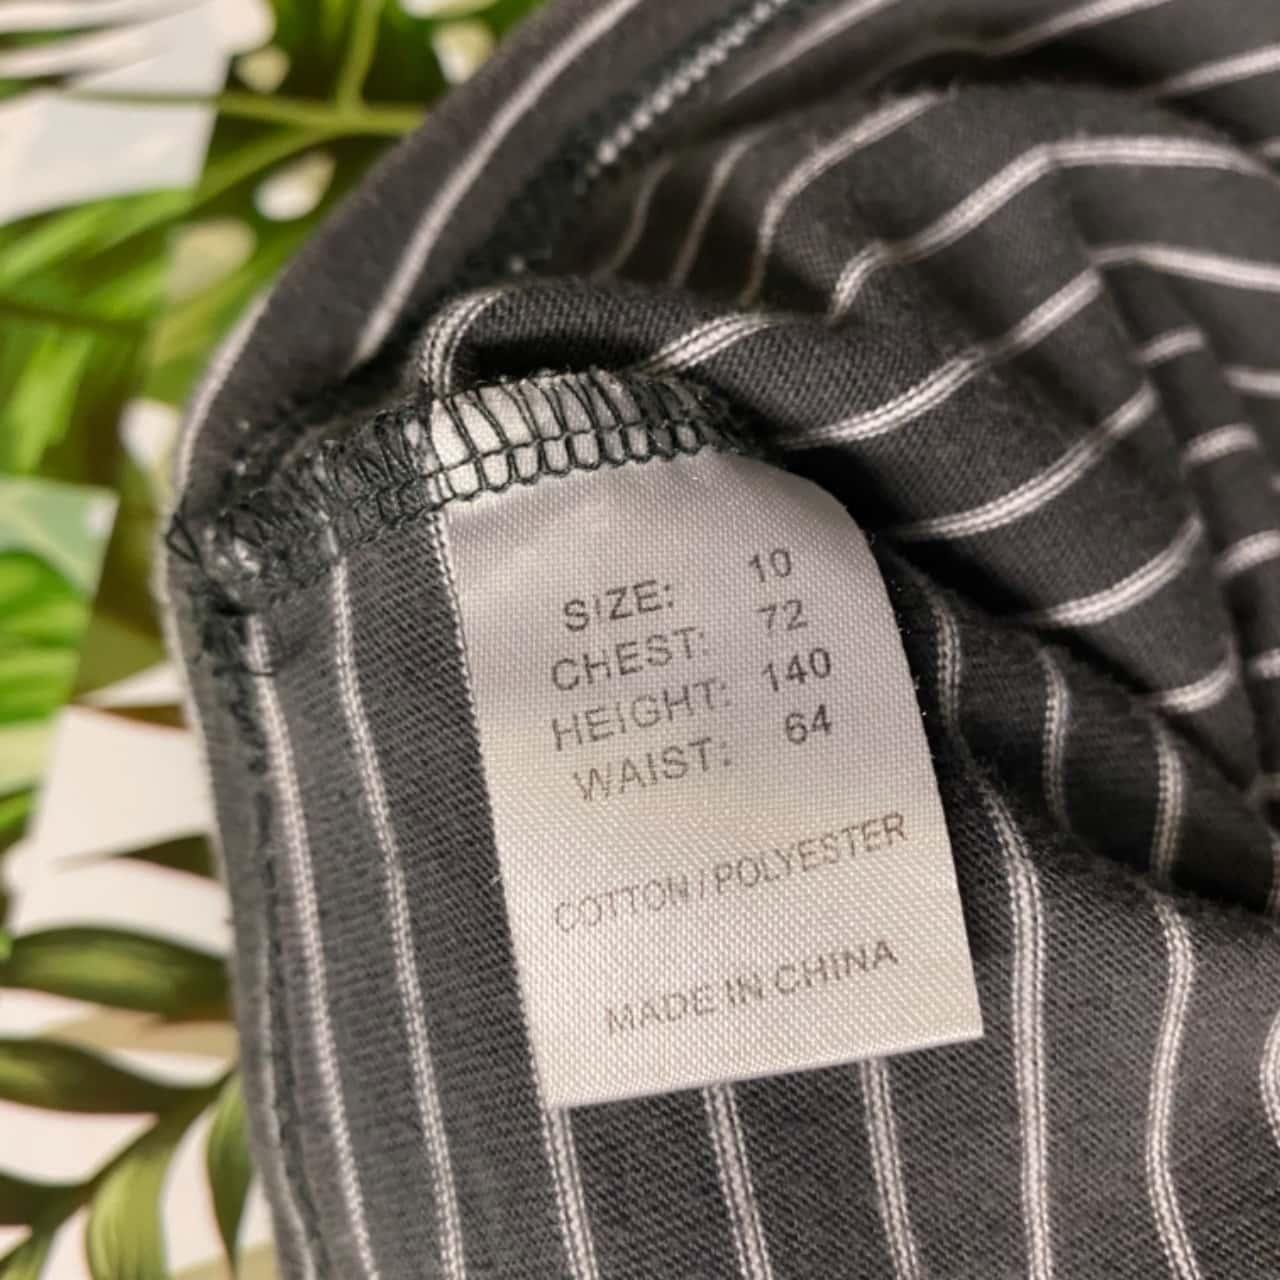 Candy Stripe Australia Kids Size 10 Tops & T-shirts Grey/Striped/White